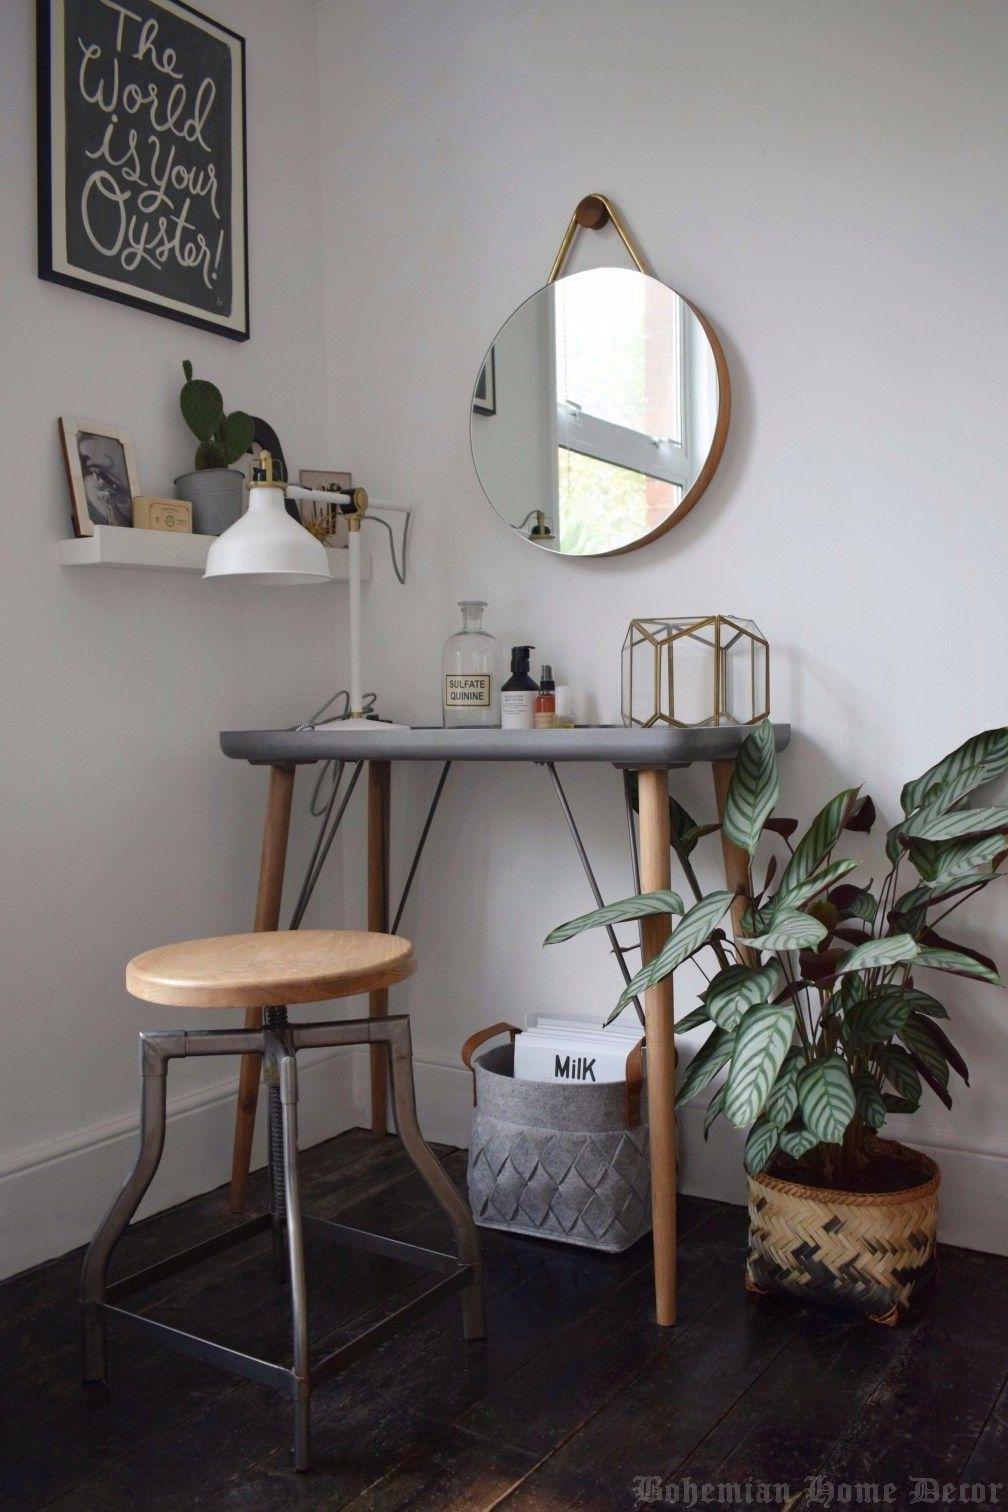 Bohemian Home Decor 2.0 – The Next Step